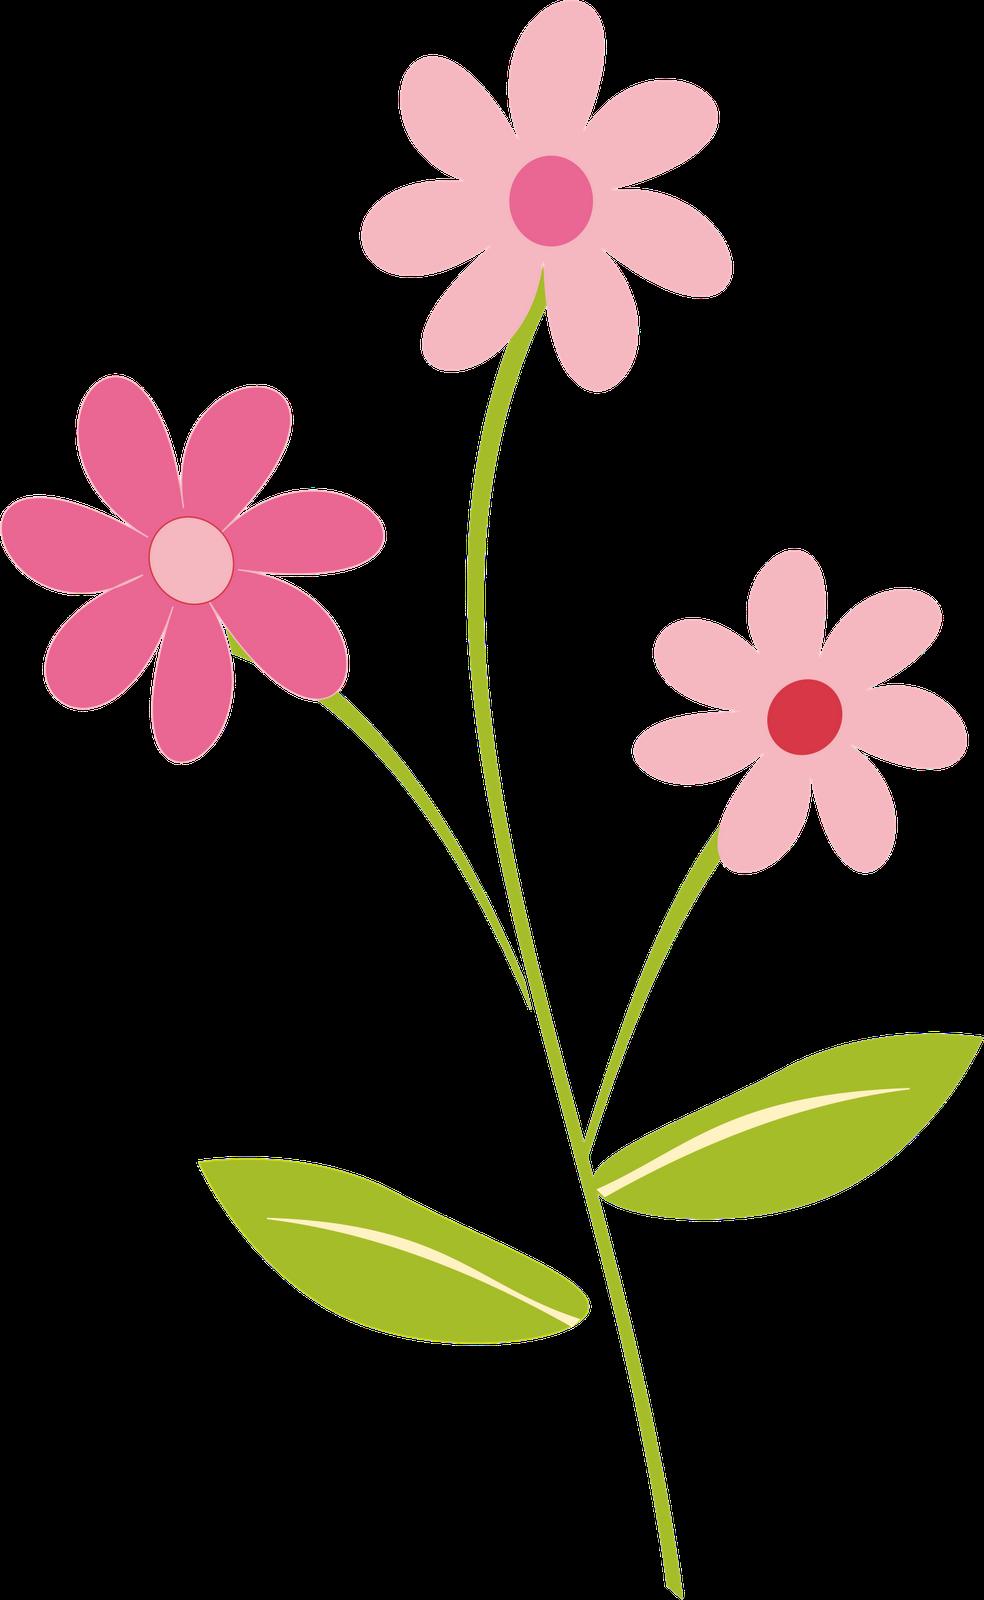 Clip Art Flowers Borders Free Flowers Healthy